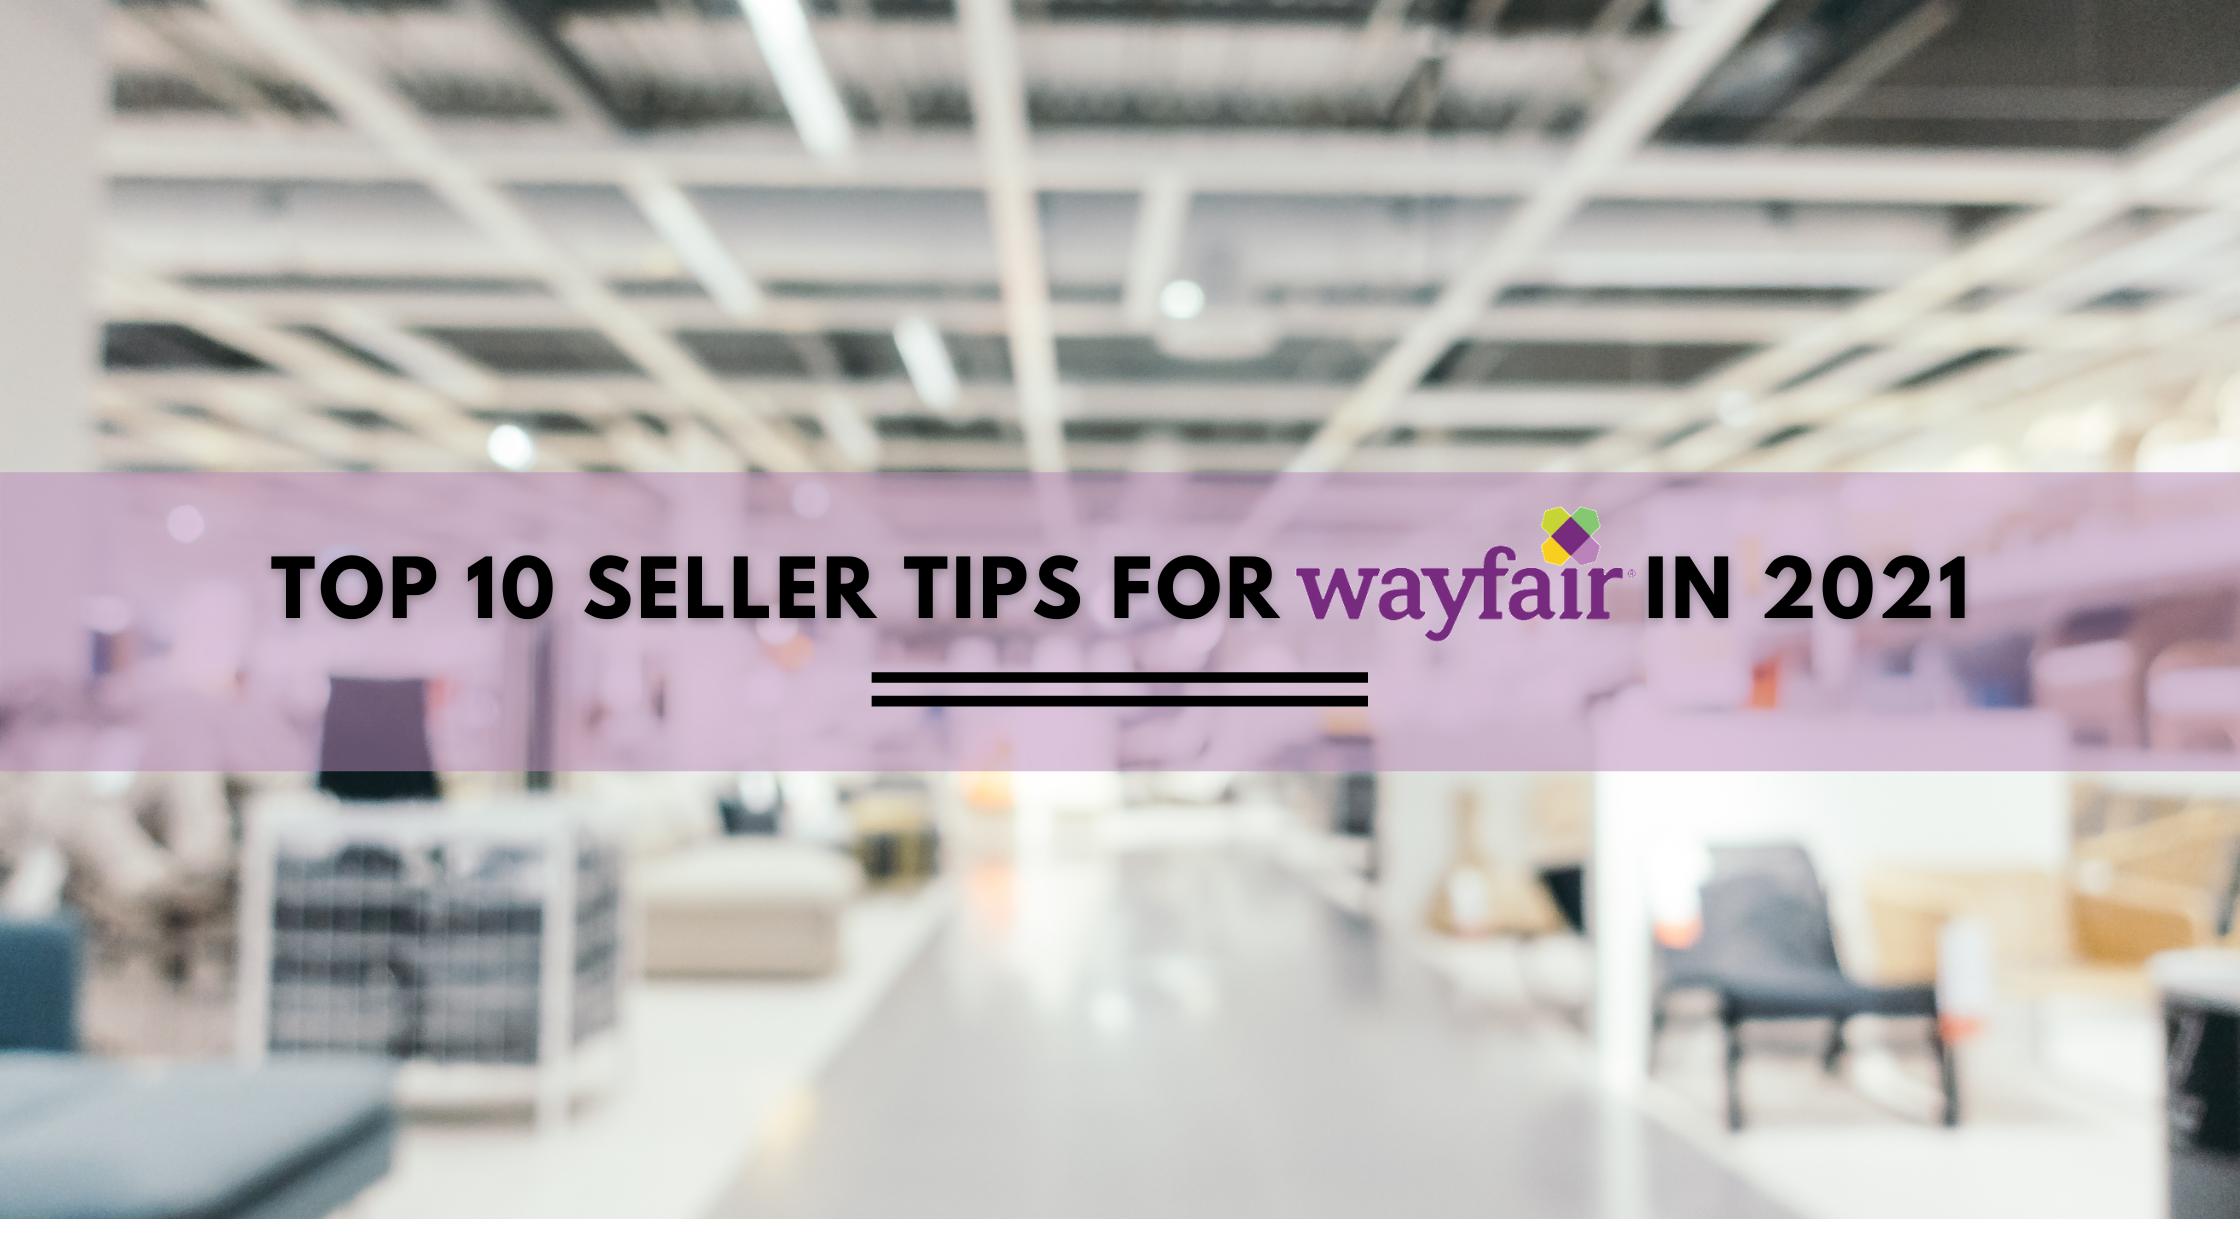 Top 10 seller tips for Wayfair in 2021